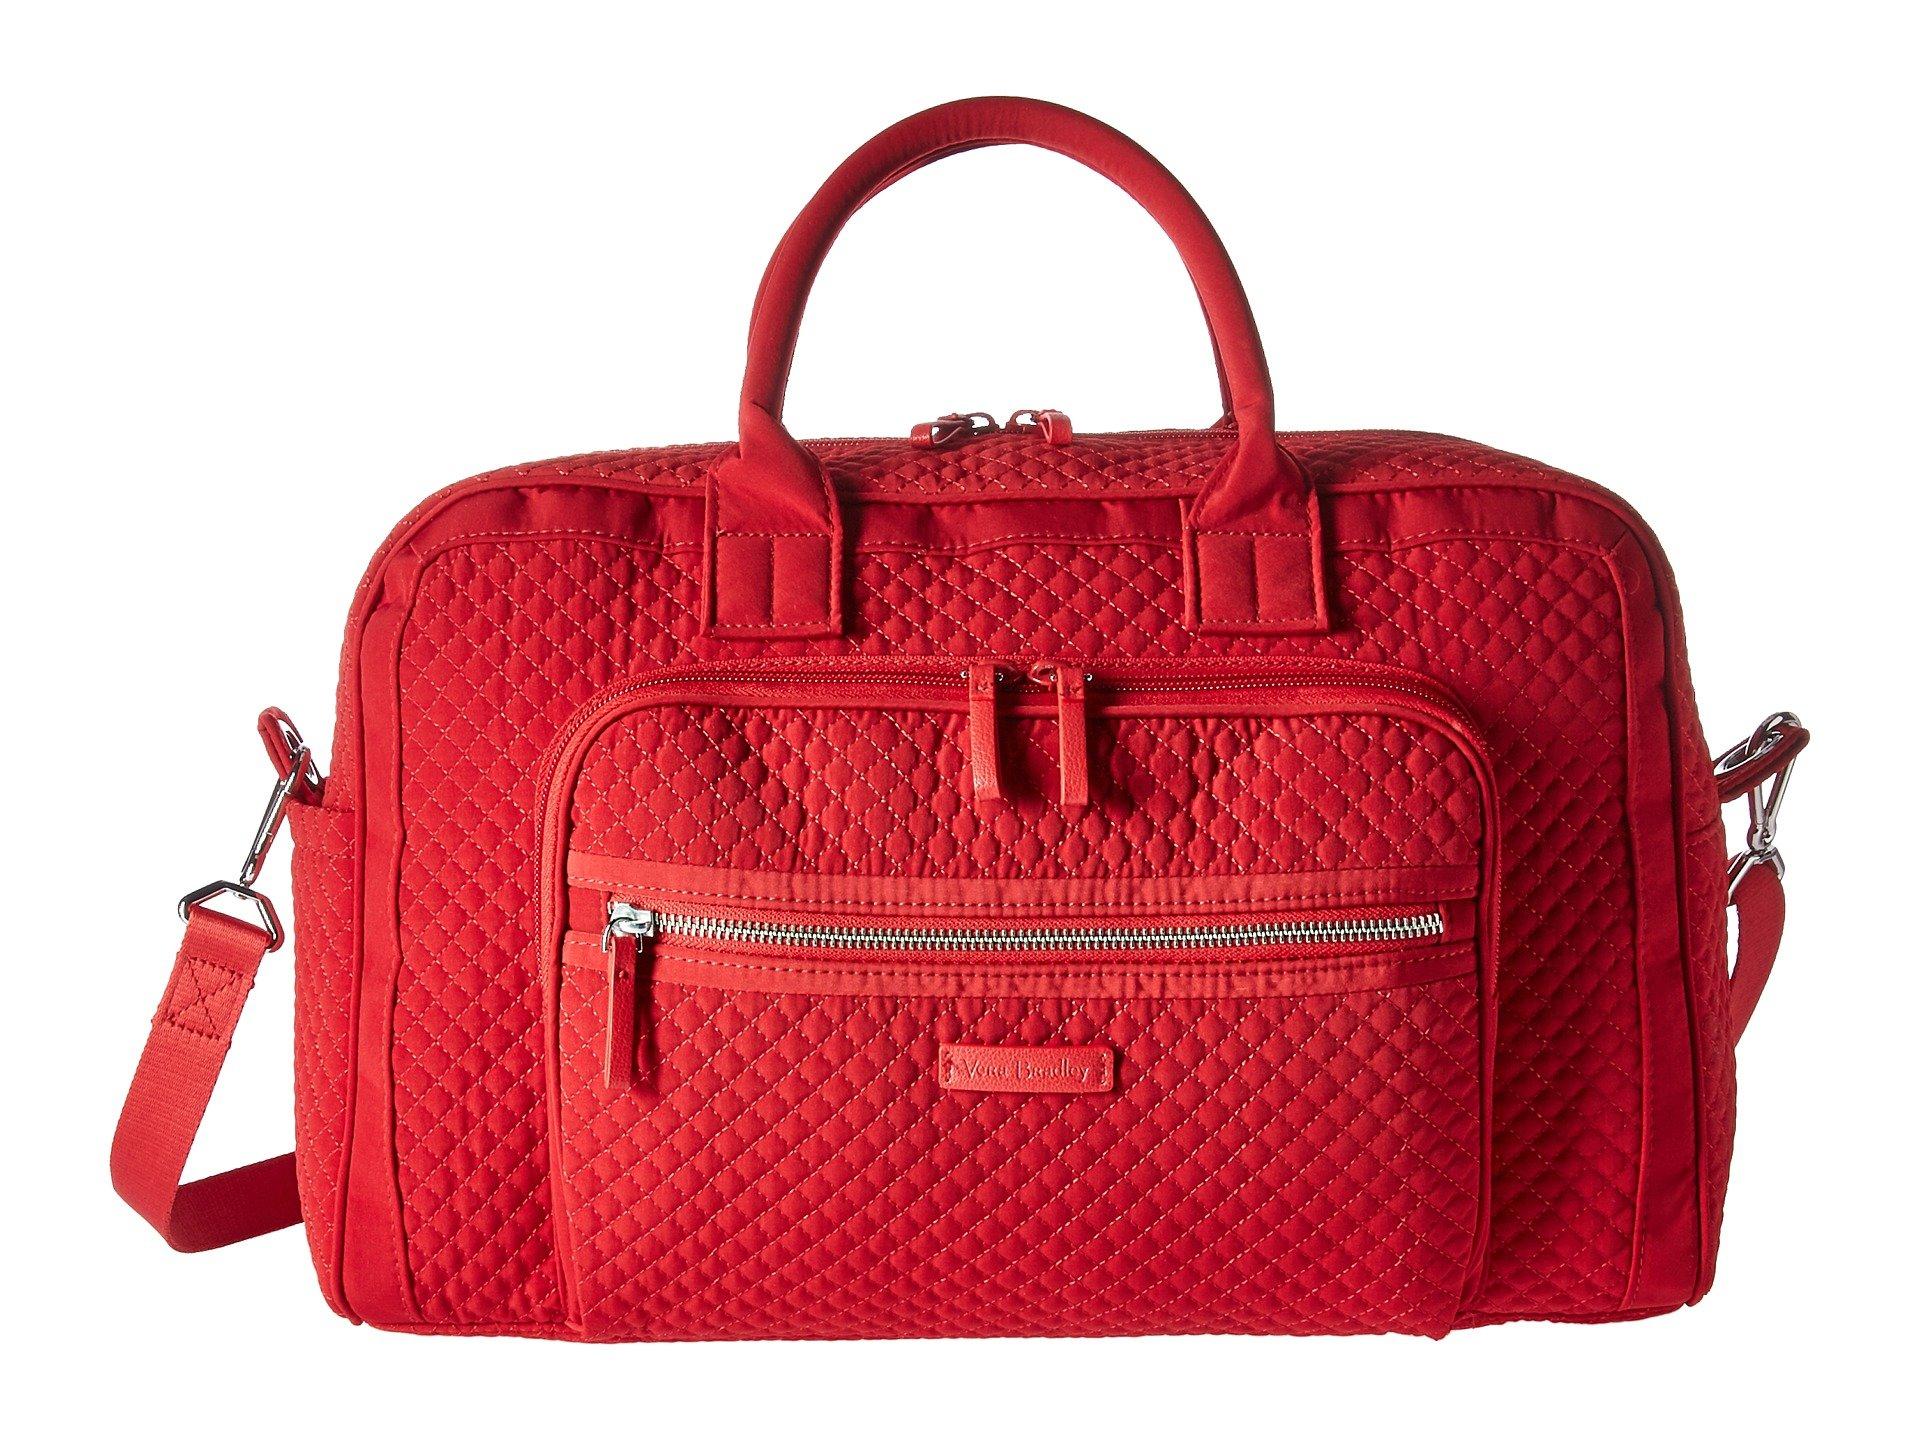 Compact Travel Red Weekender Vera Iconic Cardinal Bradley Bag HqyEEFKvw